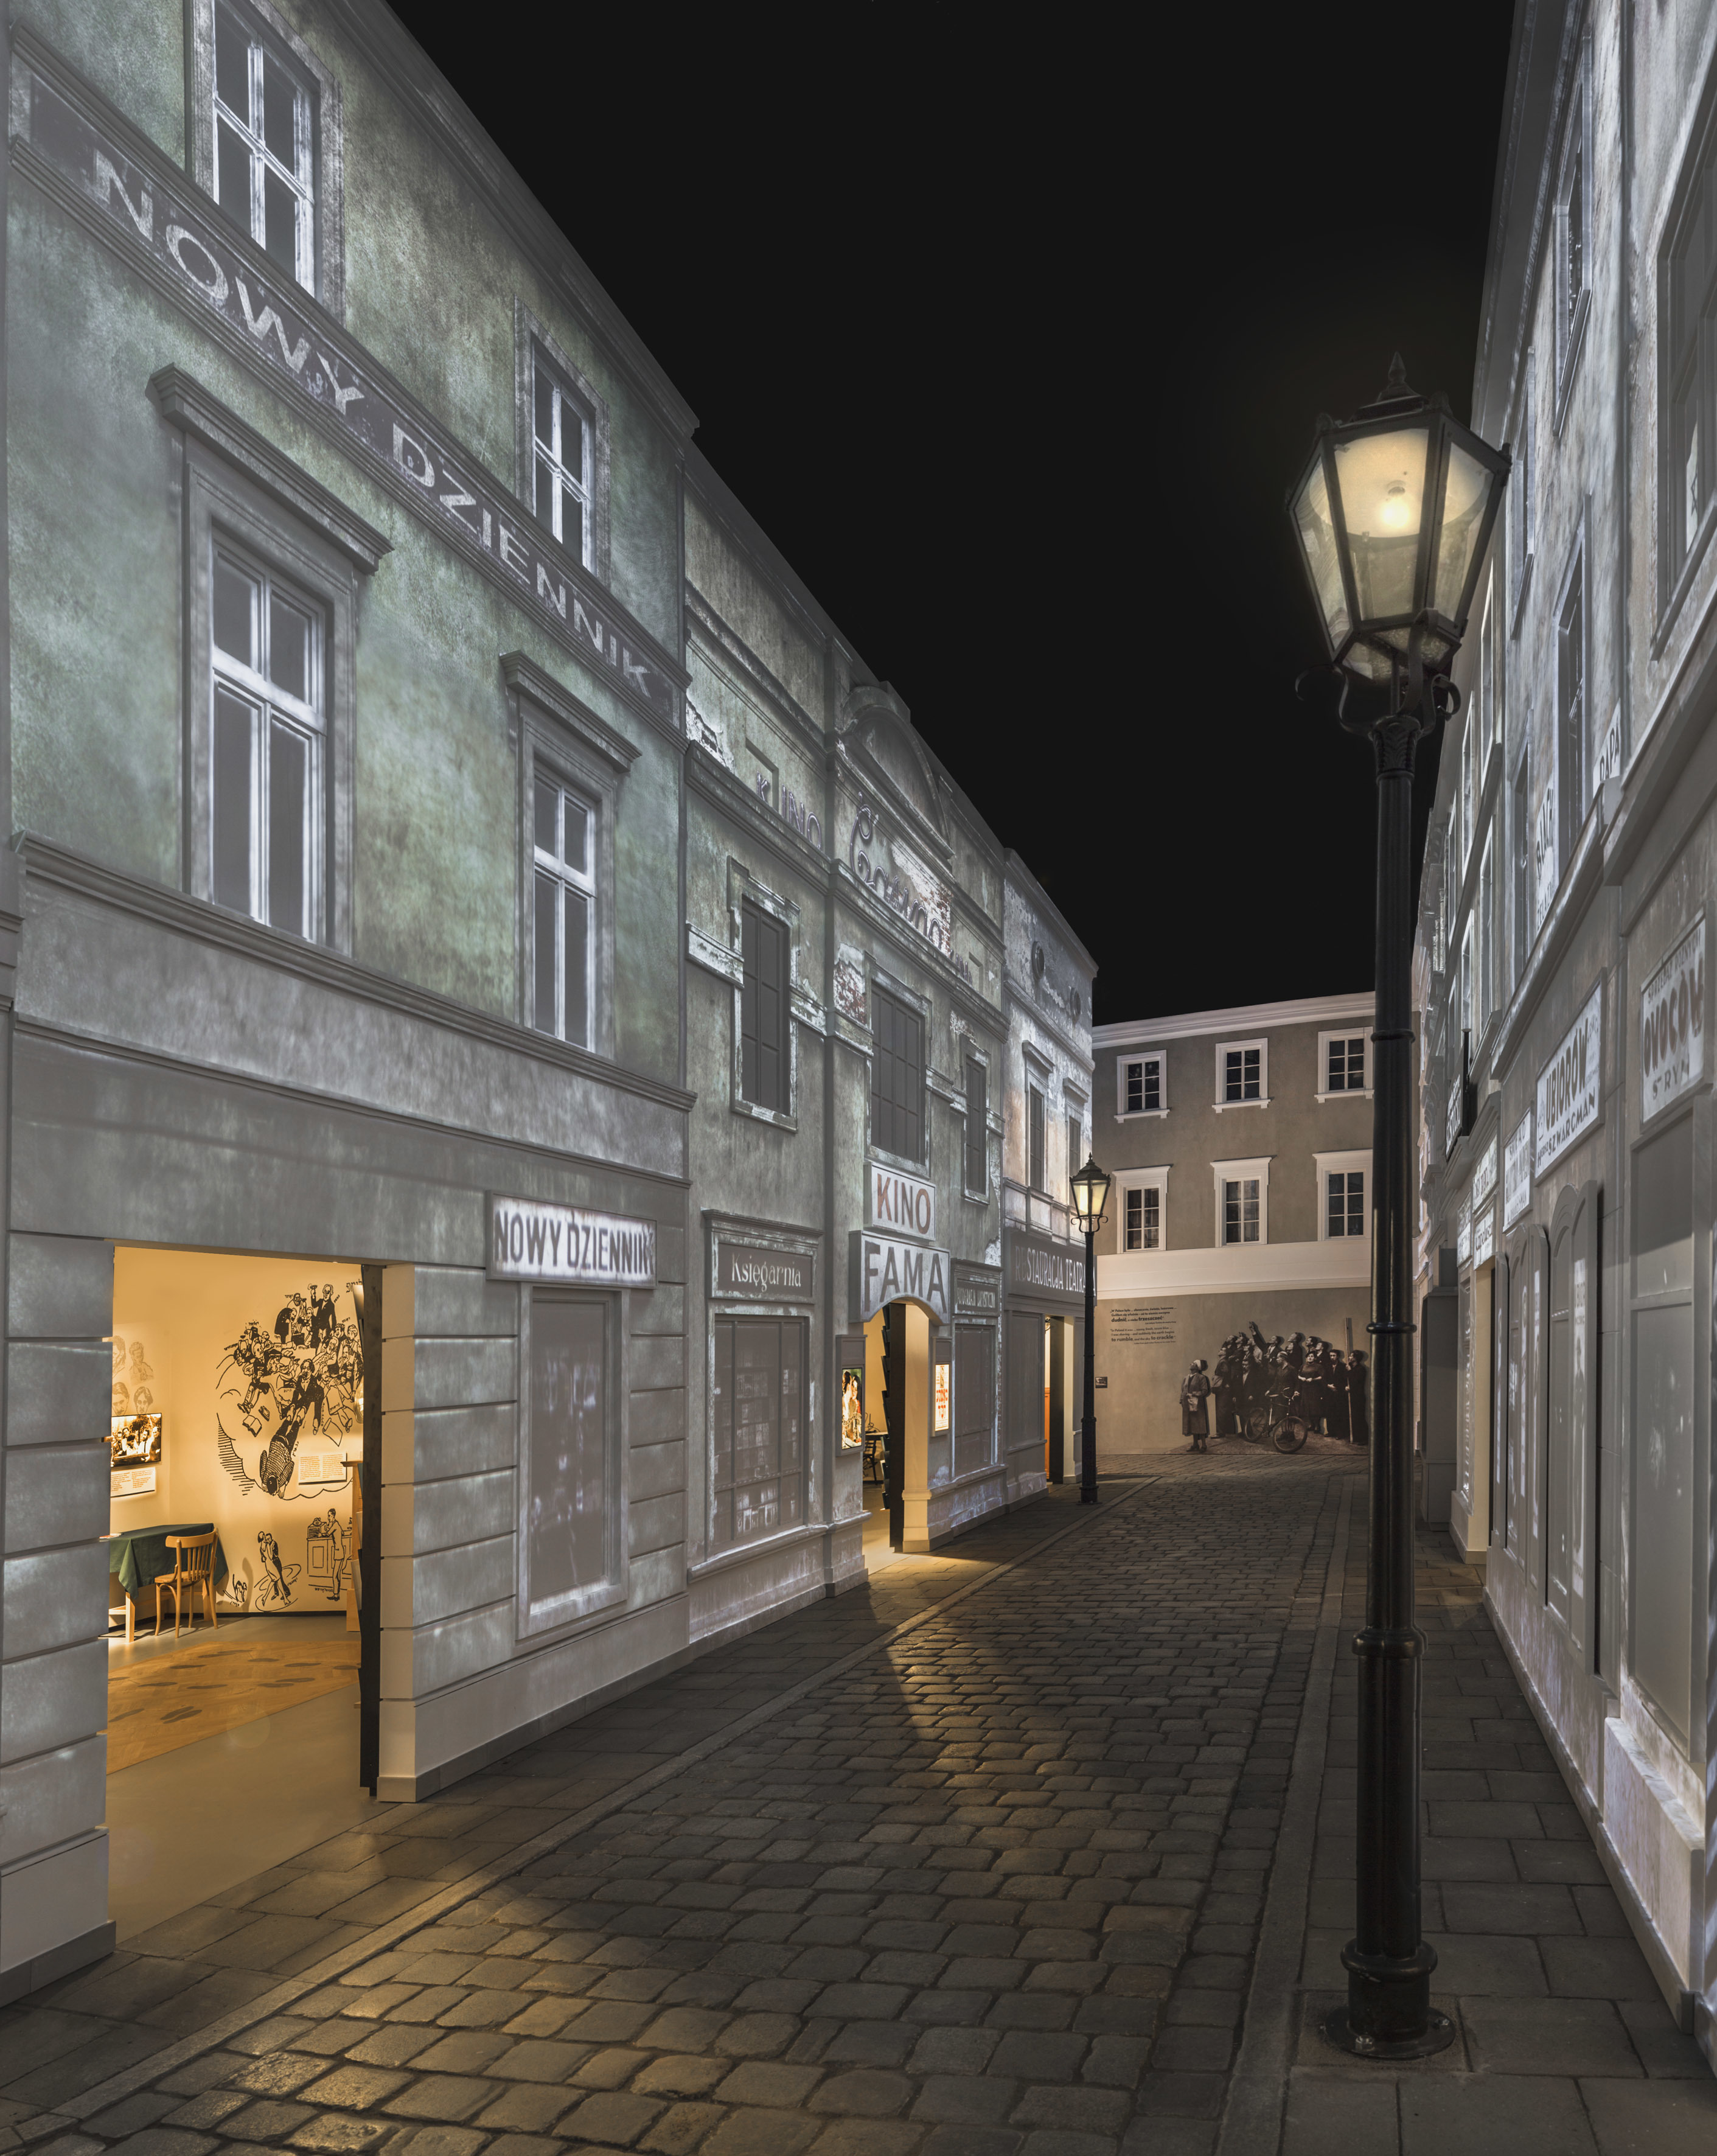 "<p><span class=""dquo"">""</span>On the Jewish Street"" Gallery. M. Starowieyska D. Golik / <span class=""caps"">POLIN</span> Museum of the History of Polish&nbsp;Jews</p>"